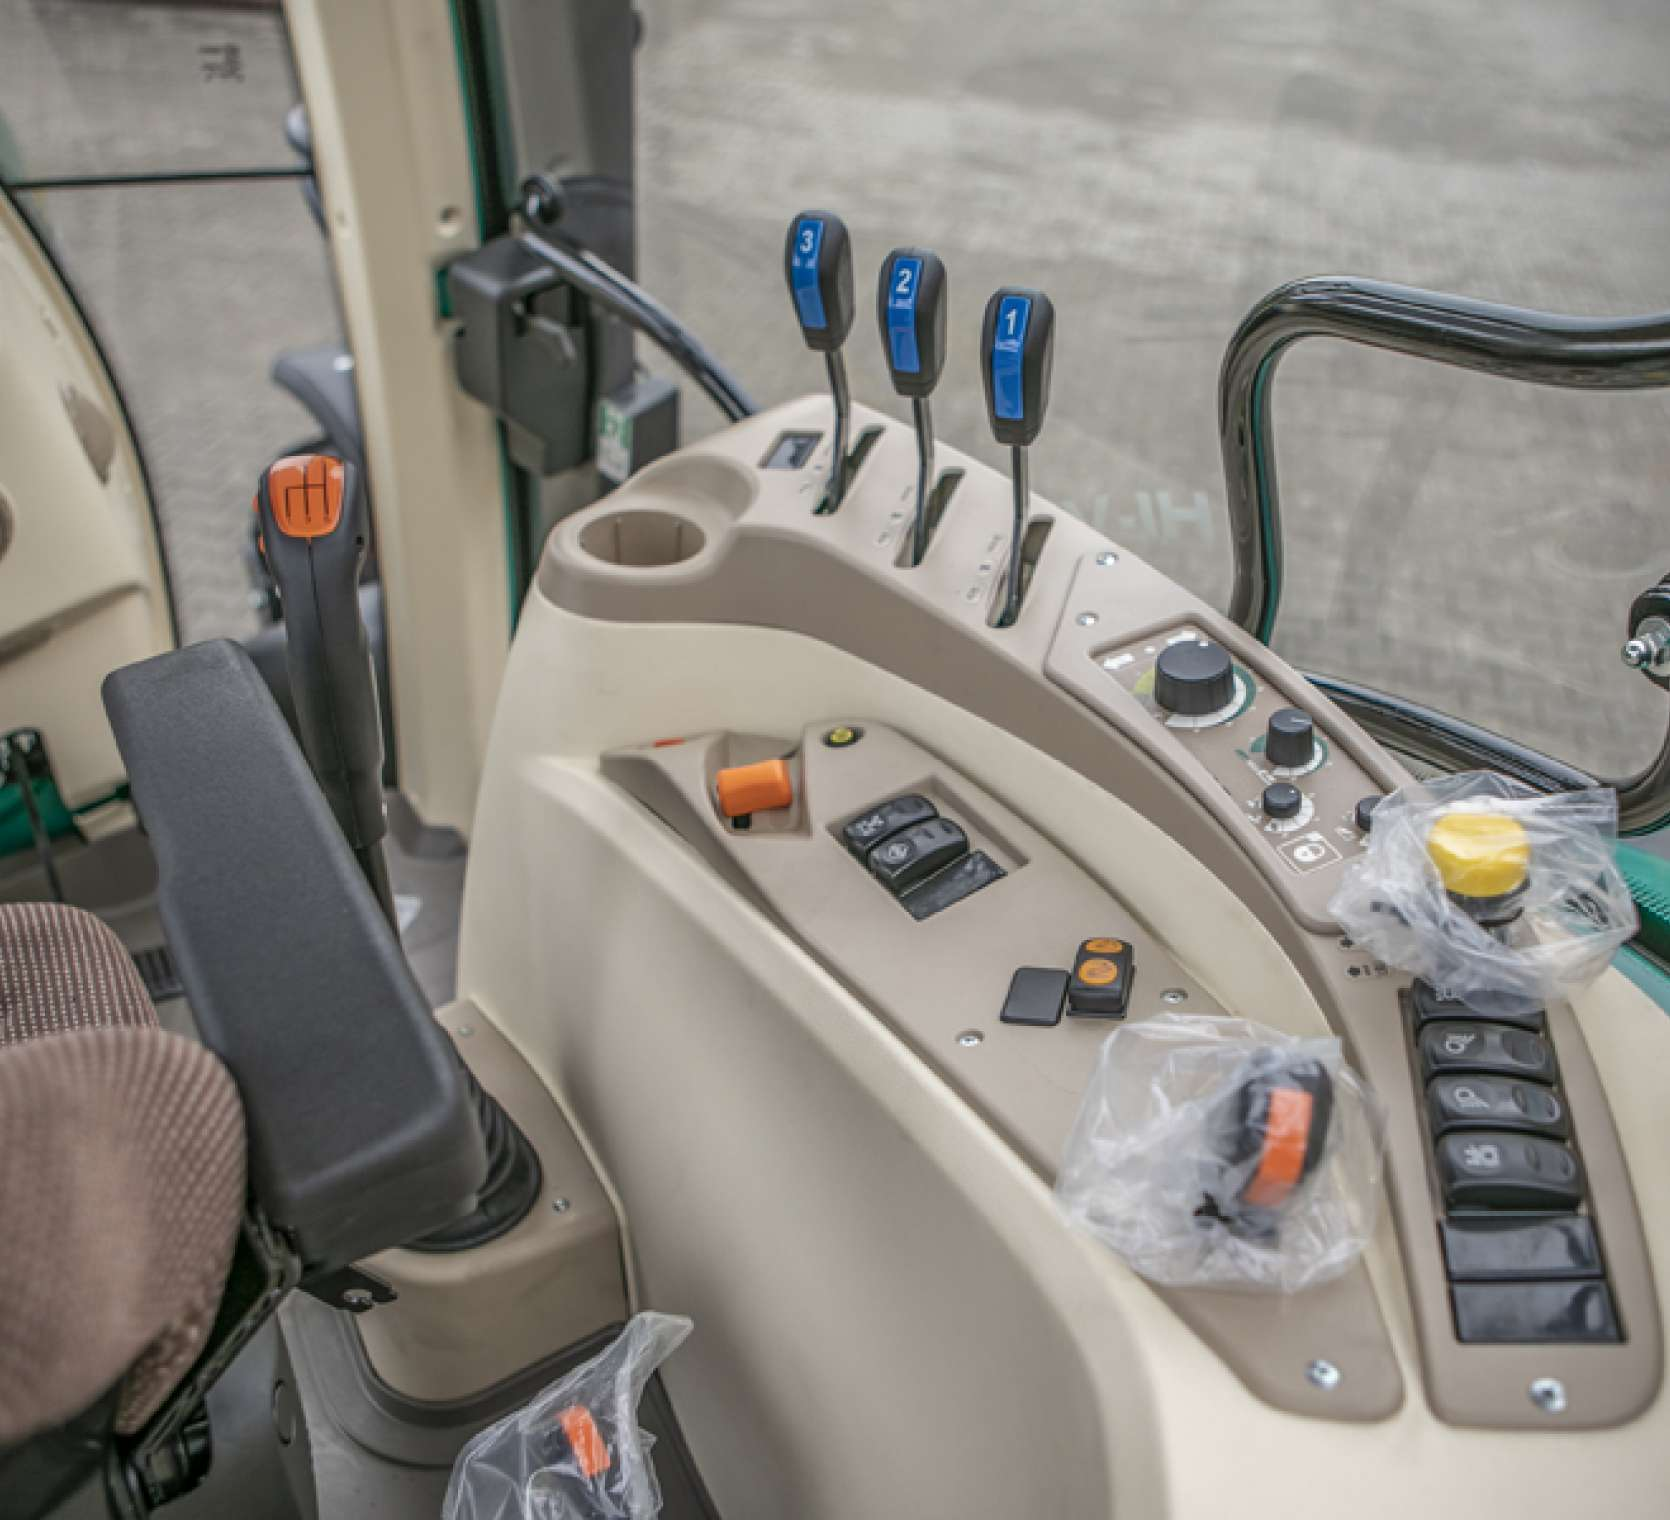 Panel sterowania w ciągniku arbos 5115 advanced